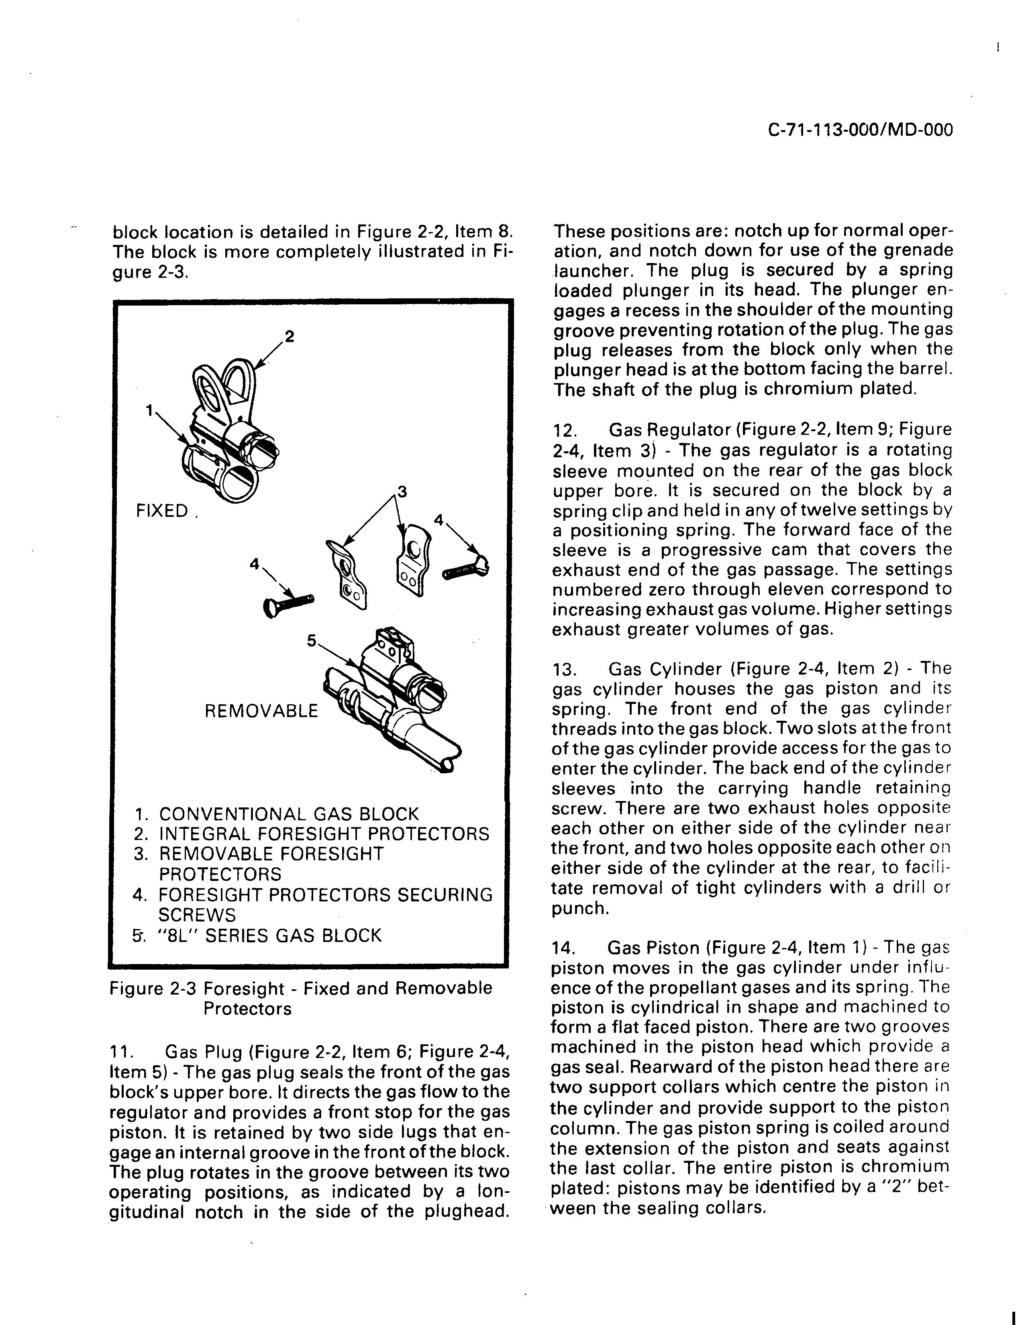 Fusil FN C1A1 et Fusil-mitrailleur FN C2A1 du Canada - Page 2 Foresi10